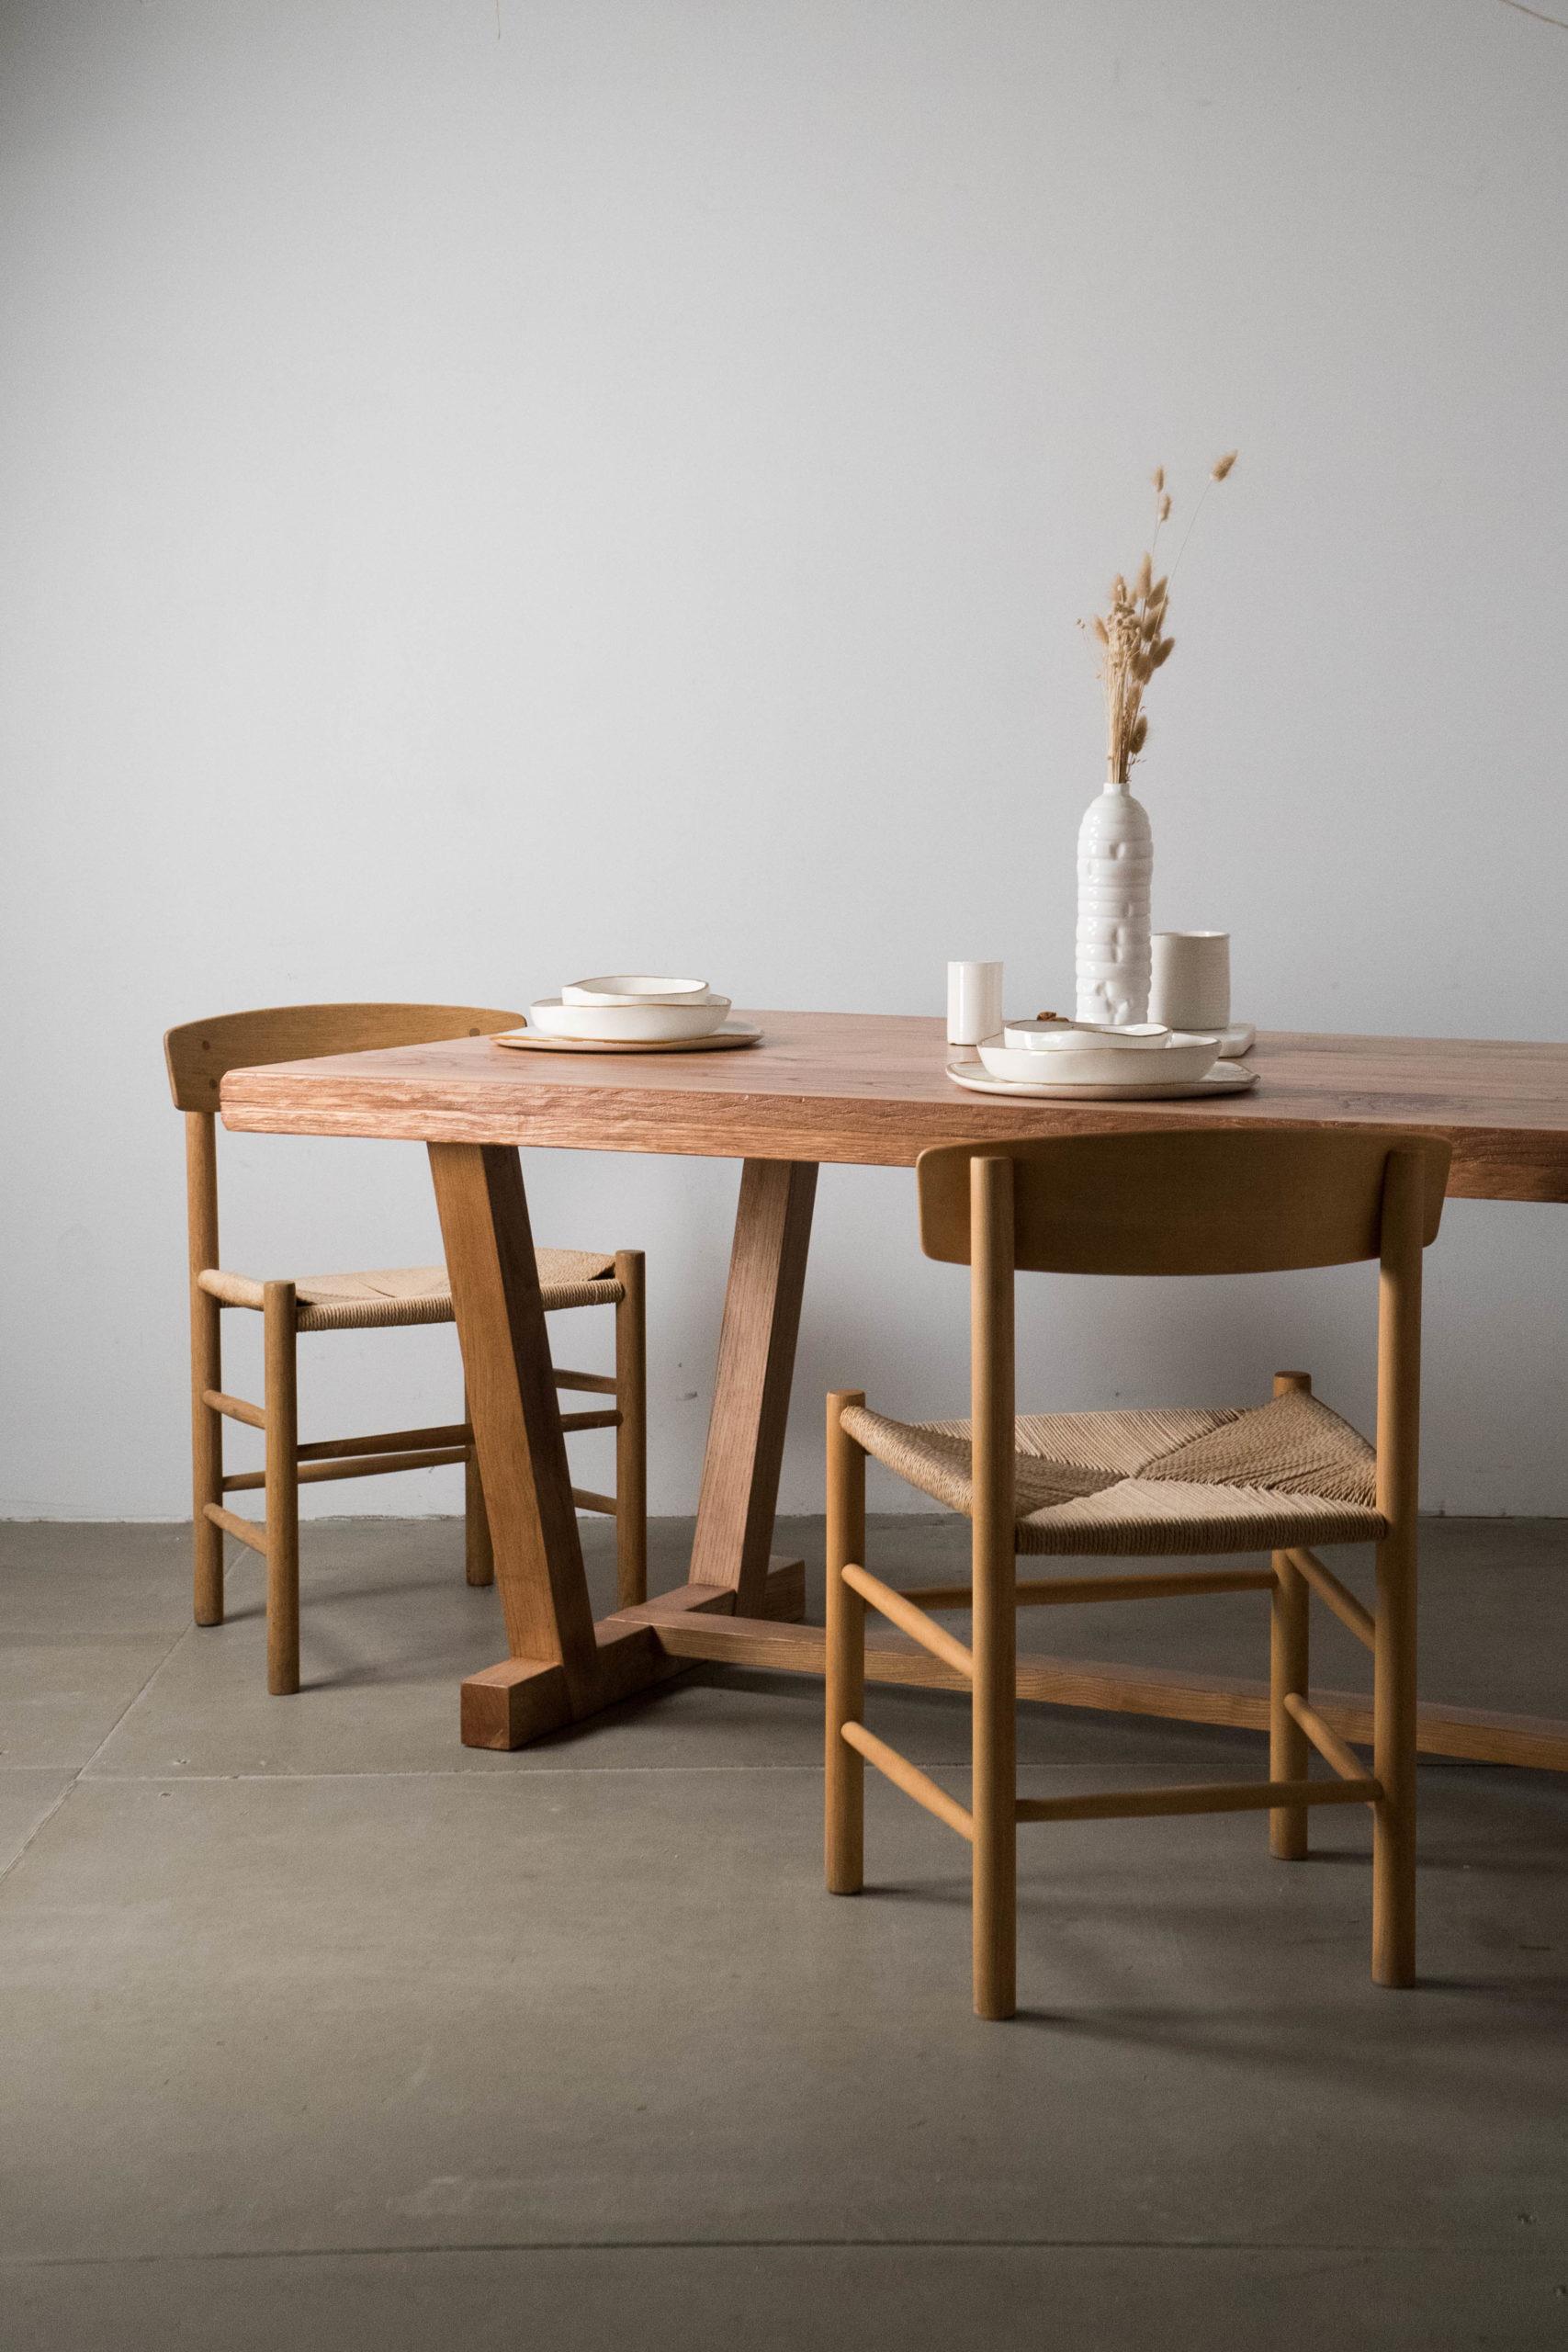 mesa de castaño macizo sillas j39 rusticas